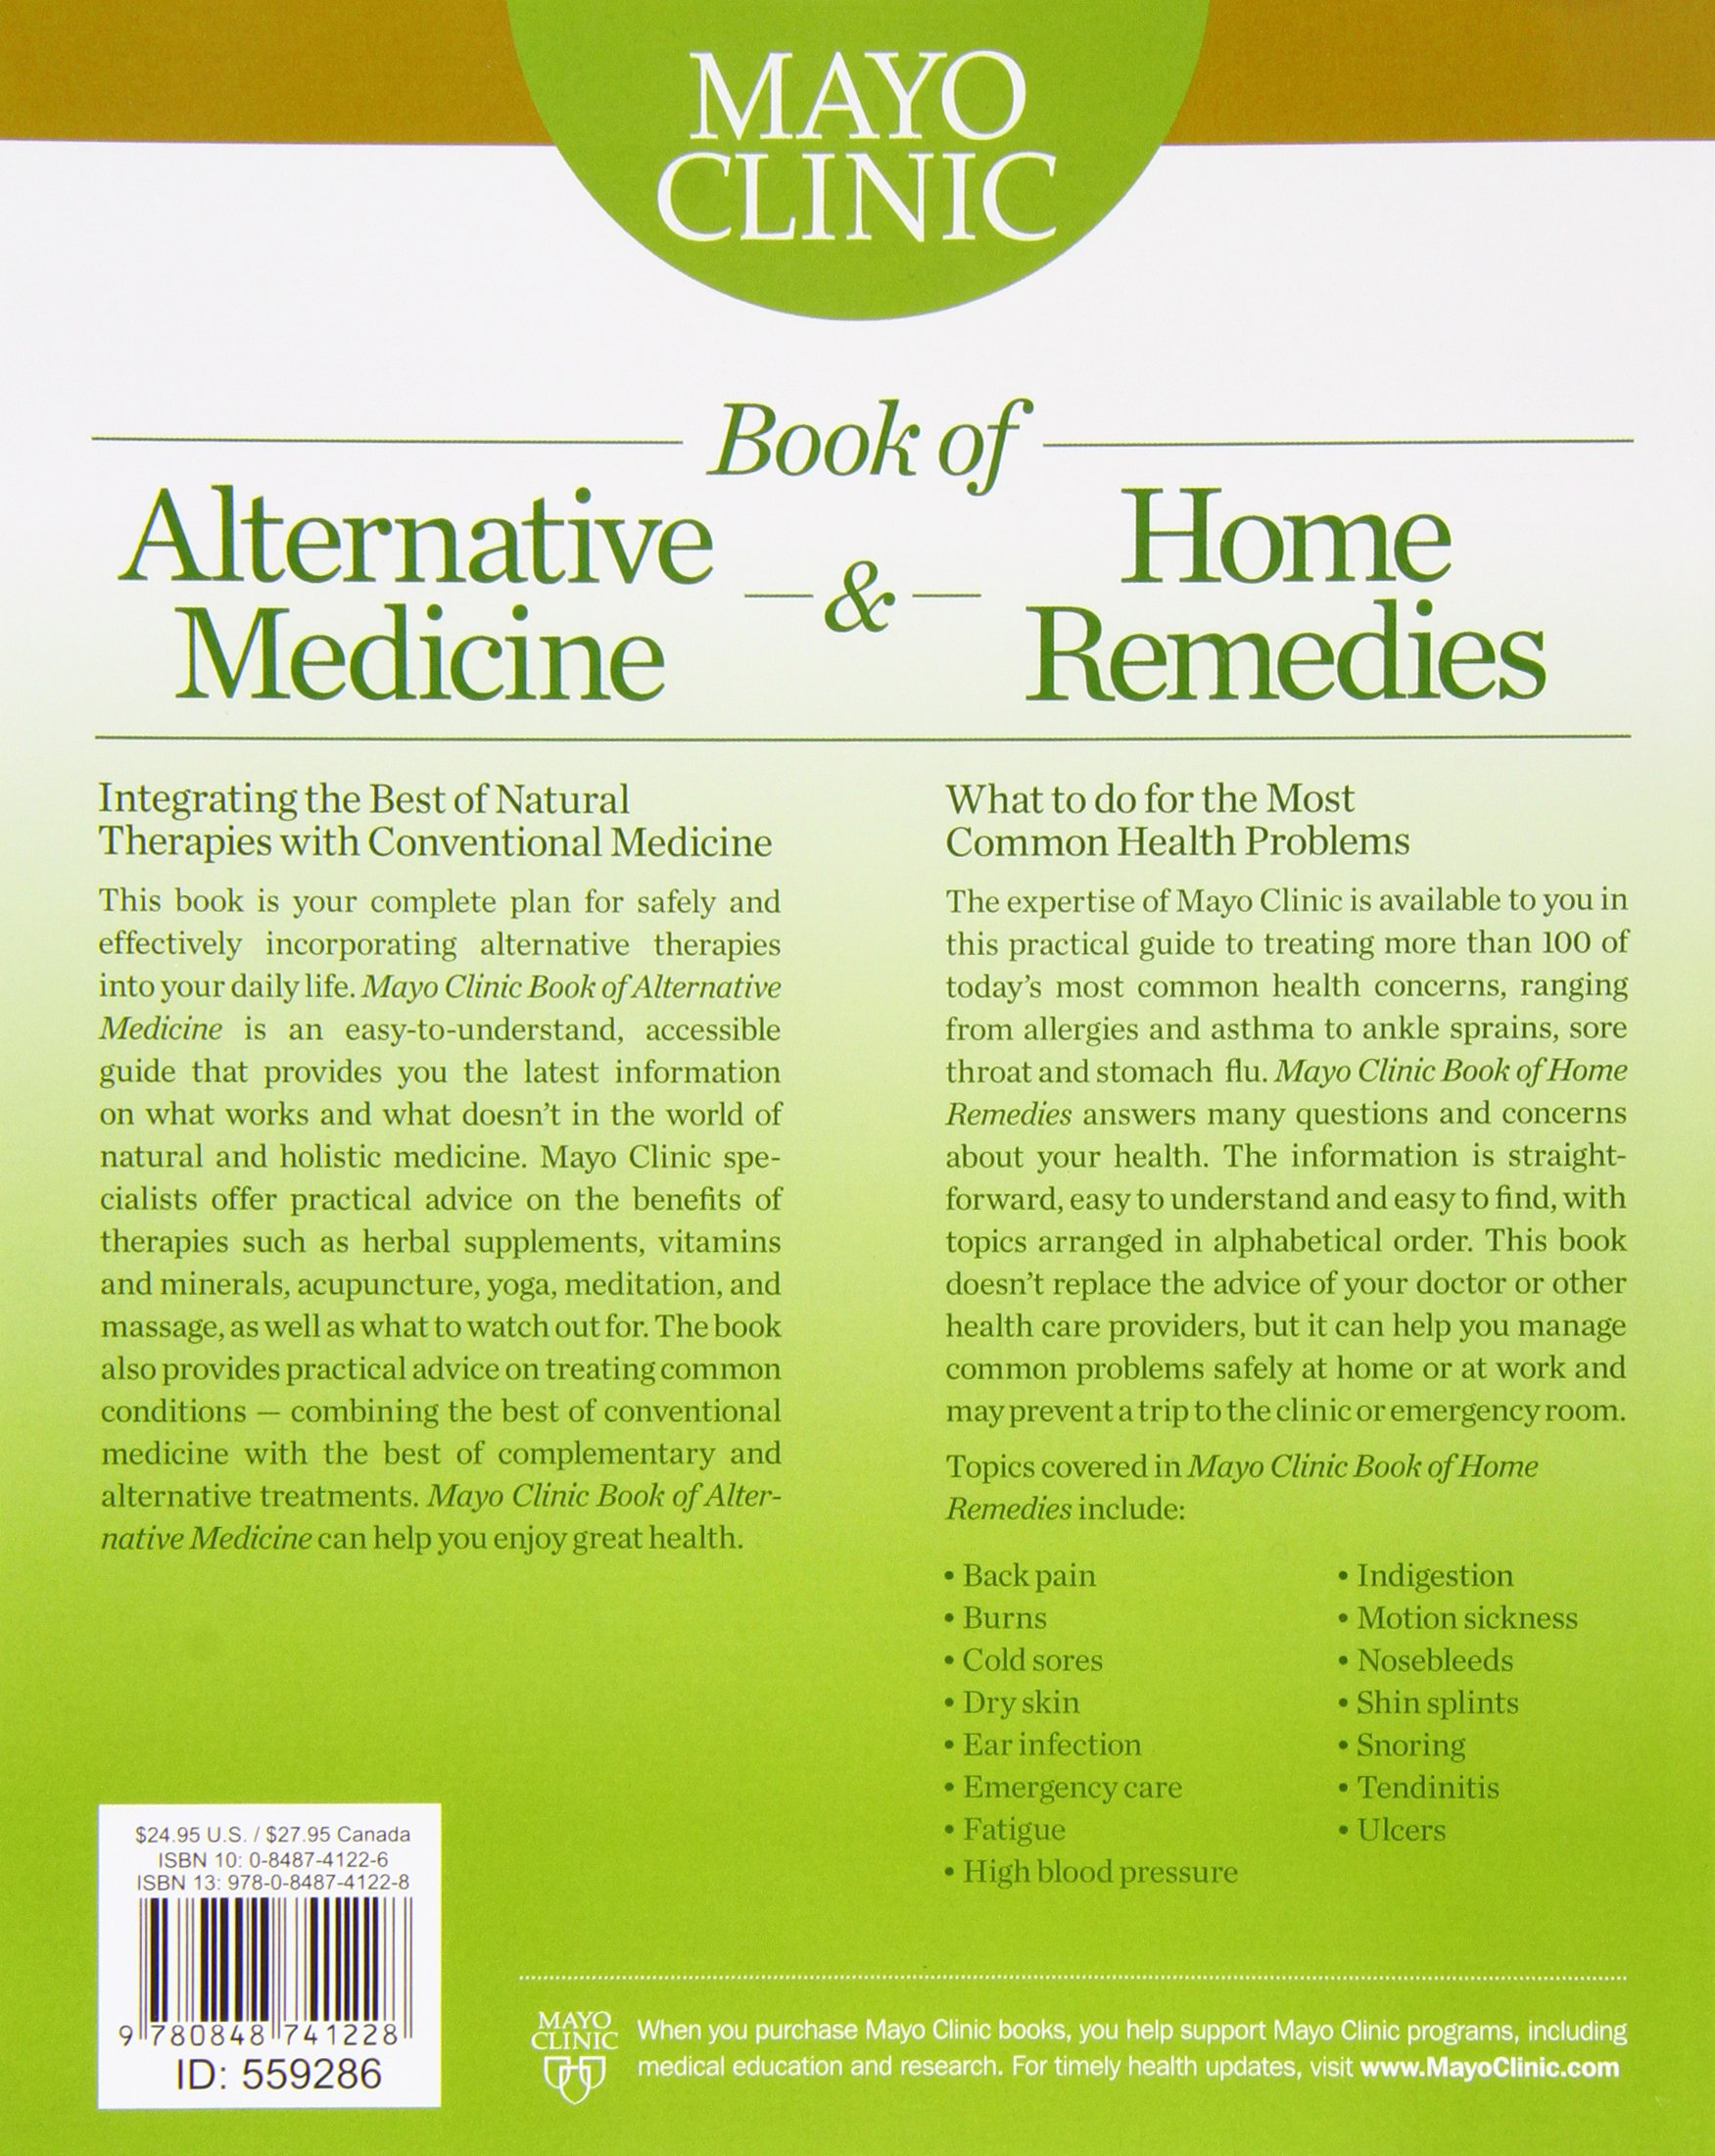 mayo clinic book of alternative medicine u0026 home remedies two